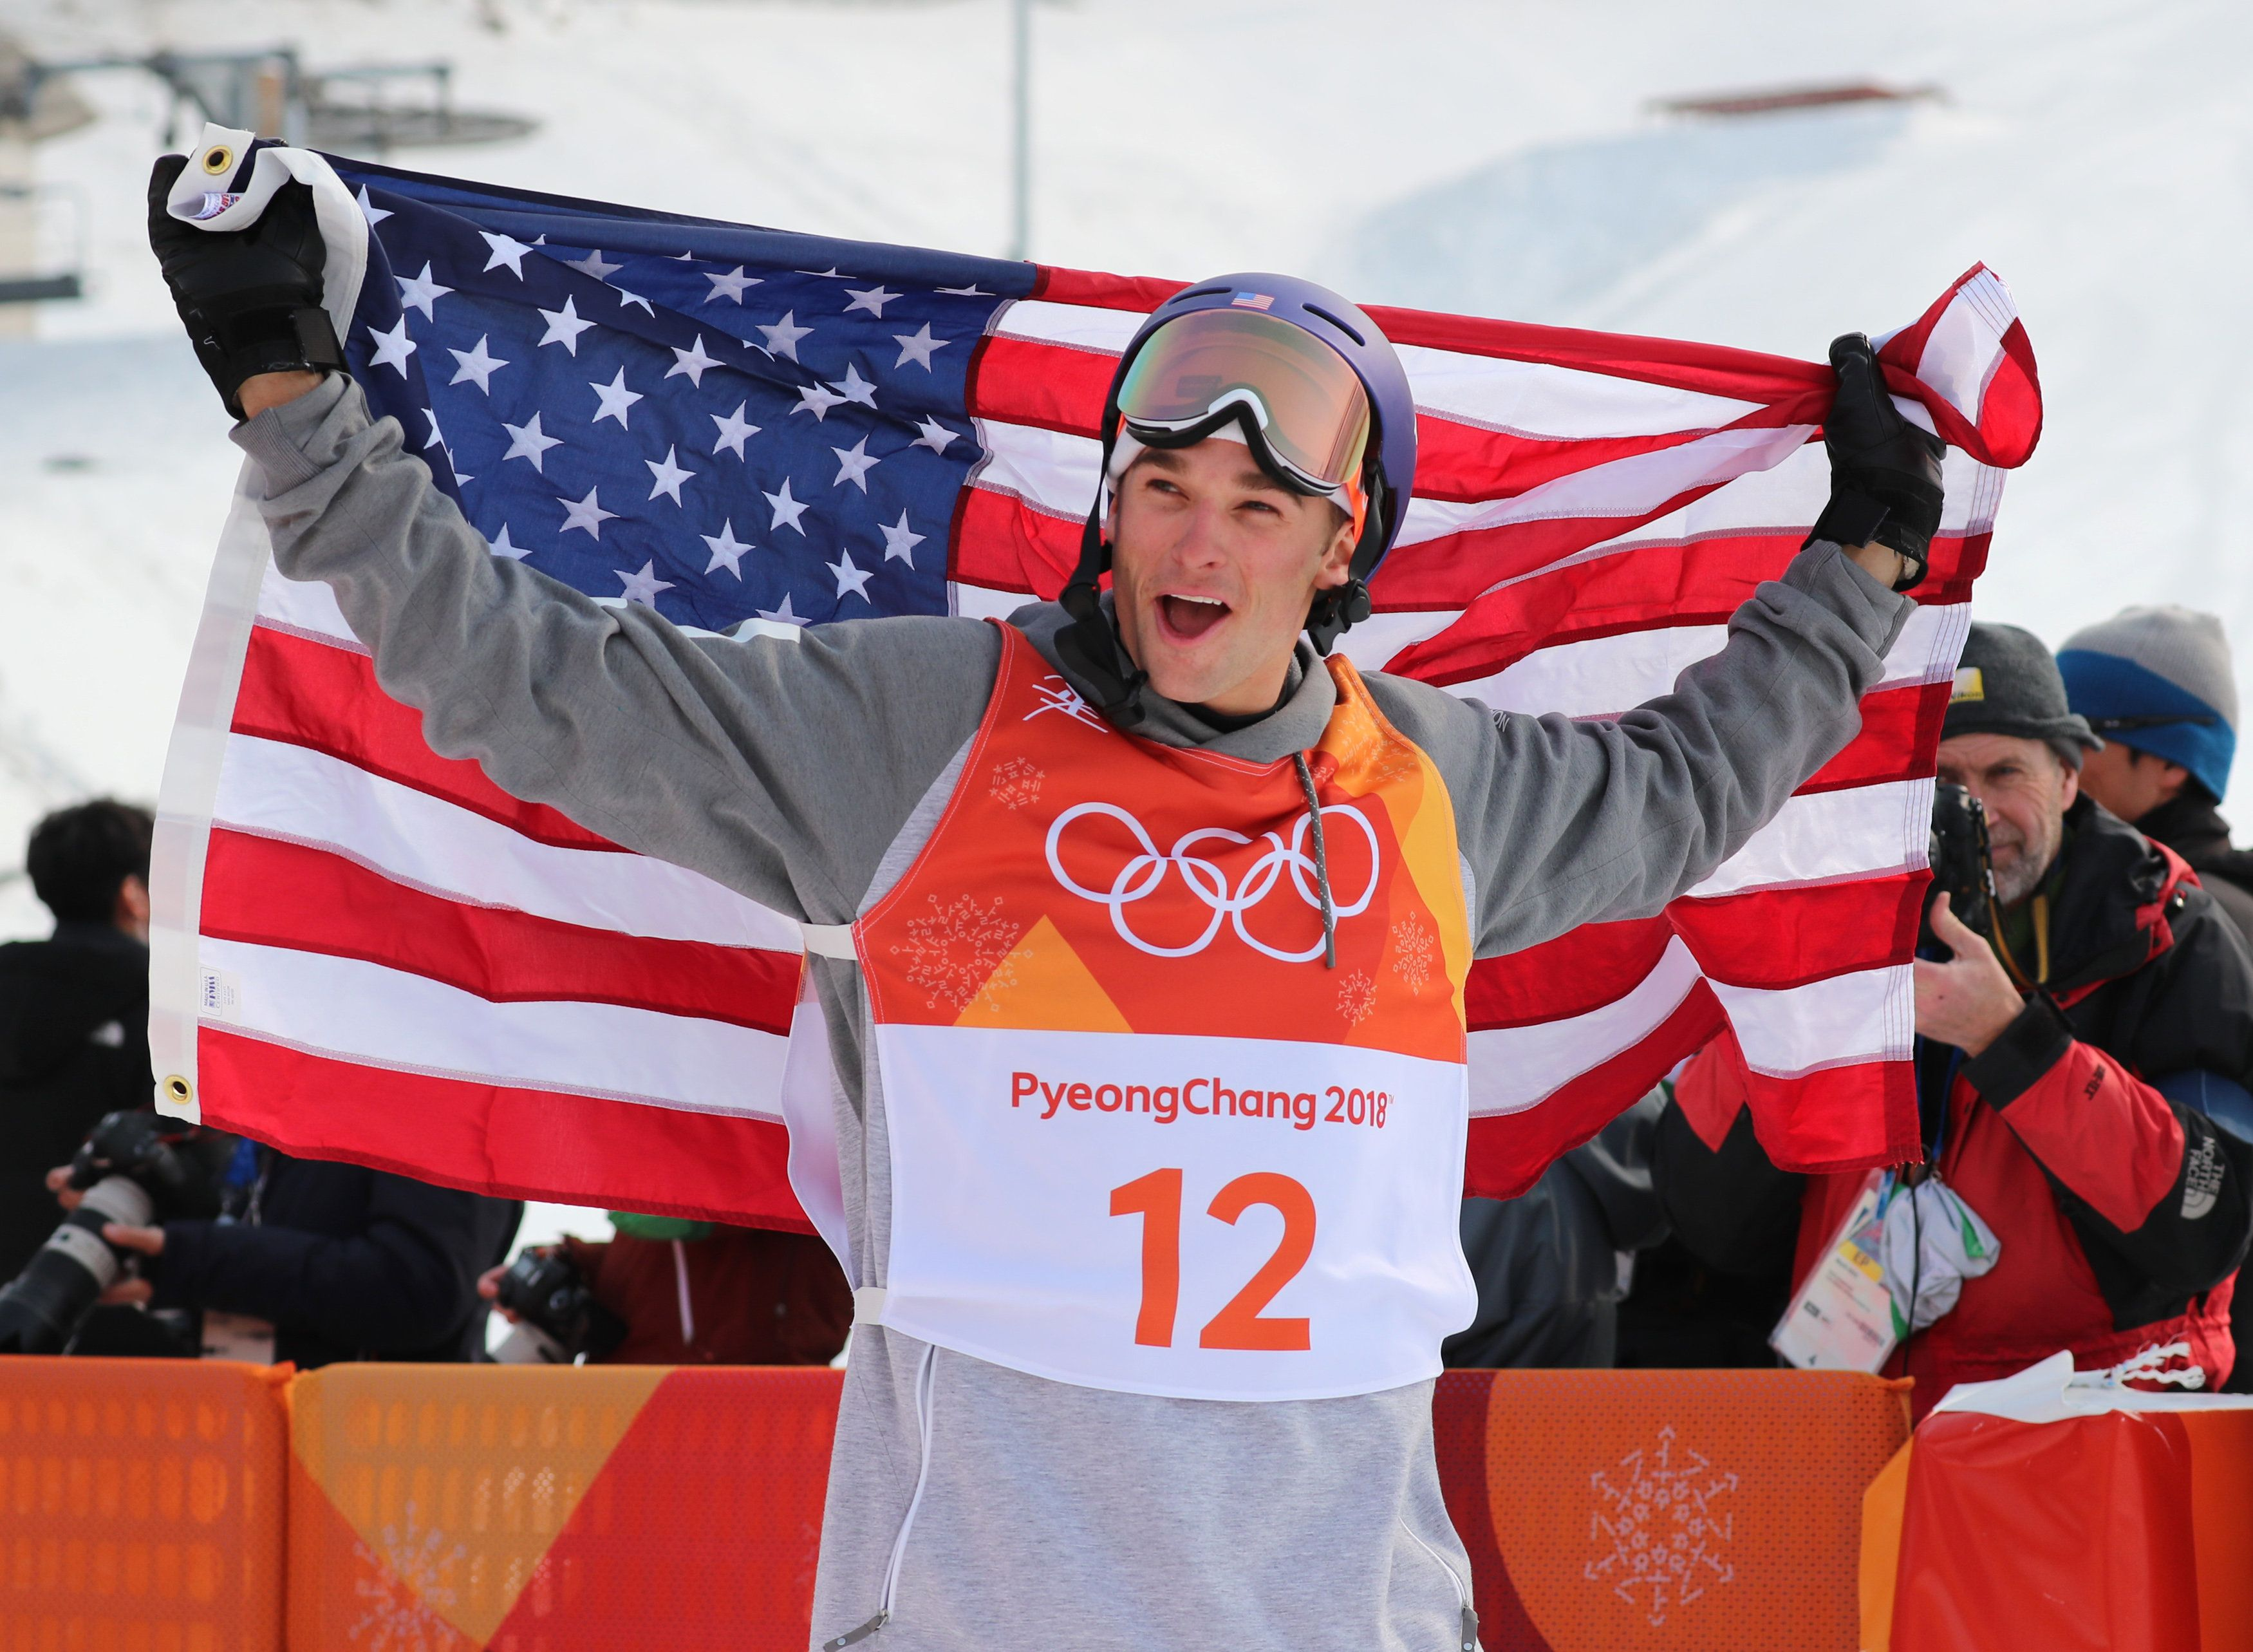 Freestyle Skiing - Pyeongchang 2018 Winter Olympics - Men's Ski Slopestyle Finals - Phoenix Snow Park - Pyeongchang, South Korea - February 18, 2018 - Silver medallist Nick Goepper of the U.S. celebrates. REUTERS/Mike Blake